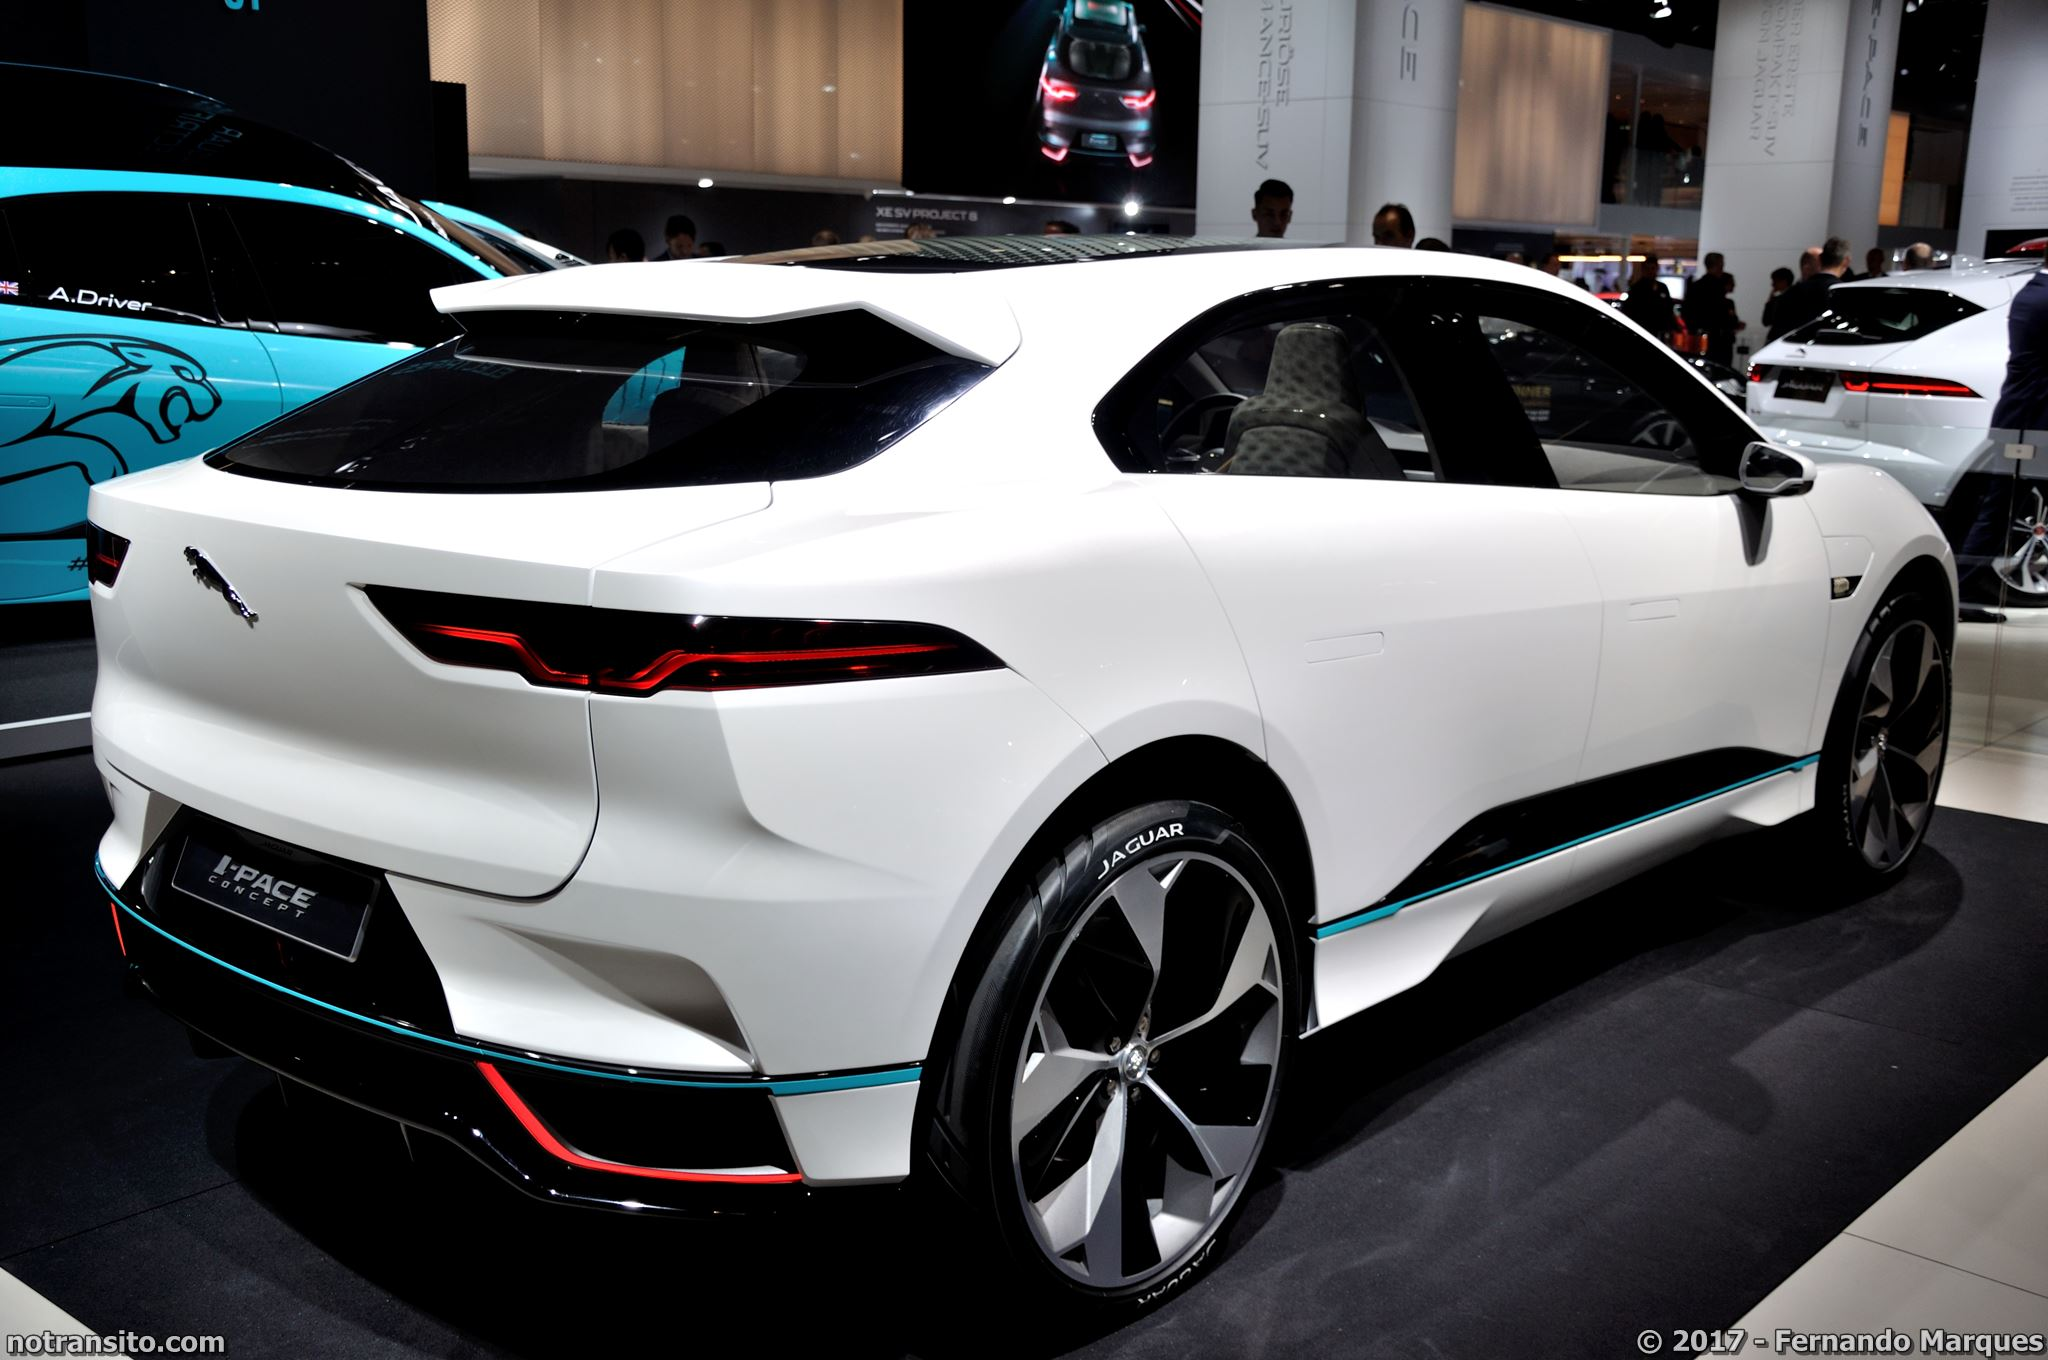 Jaguar-I-Pace-Frankfurt-2017-005